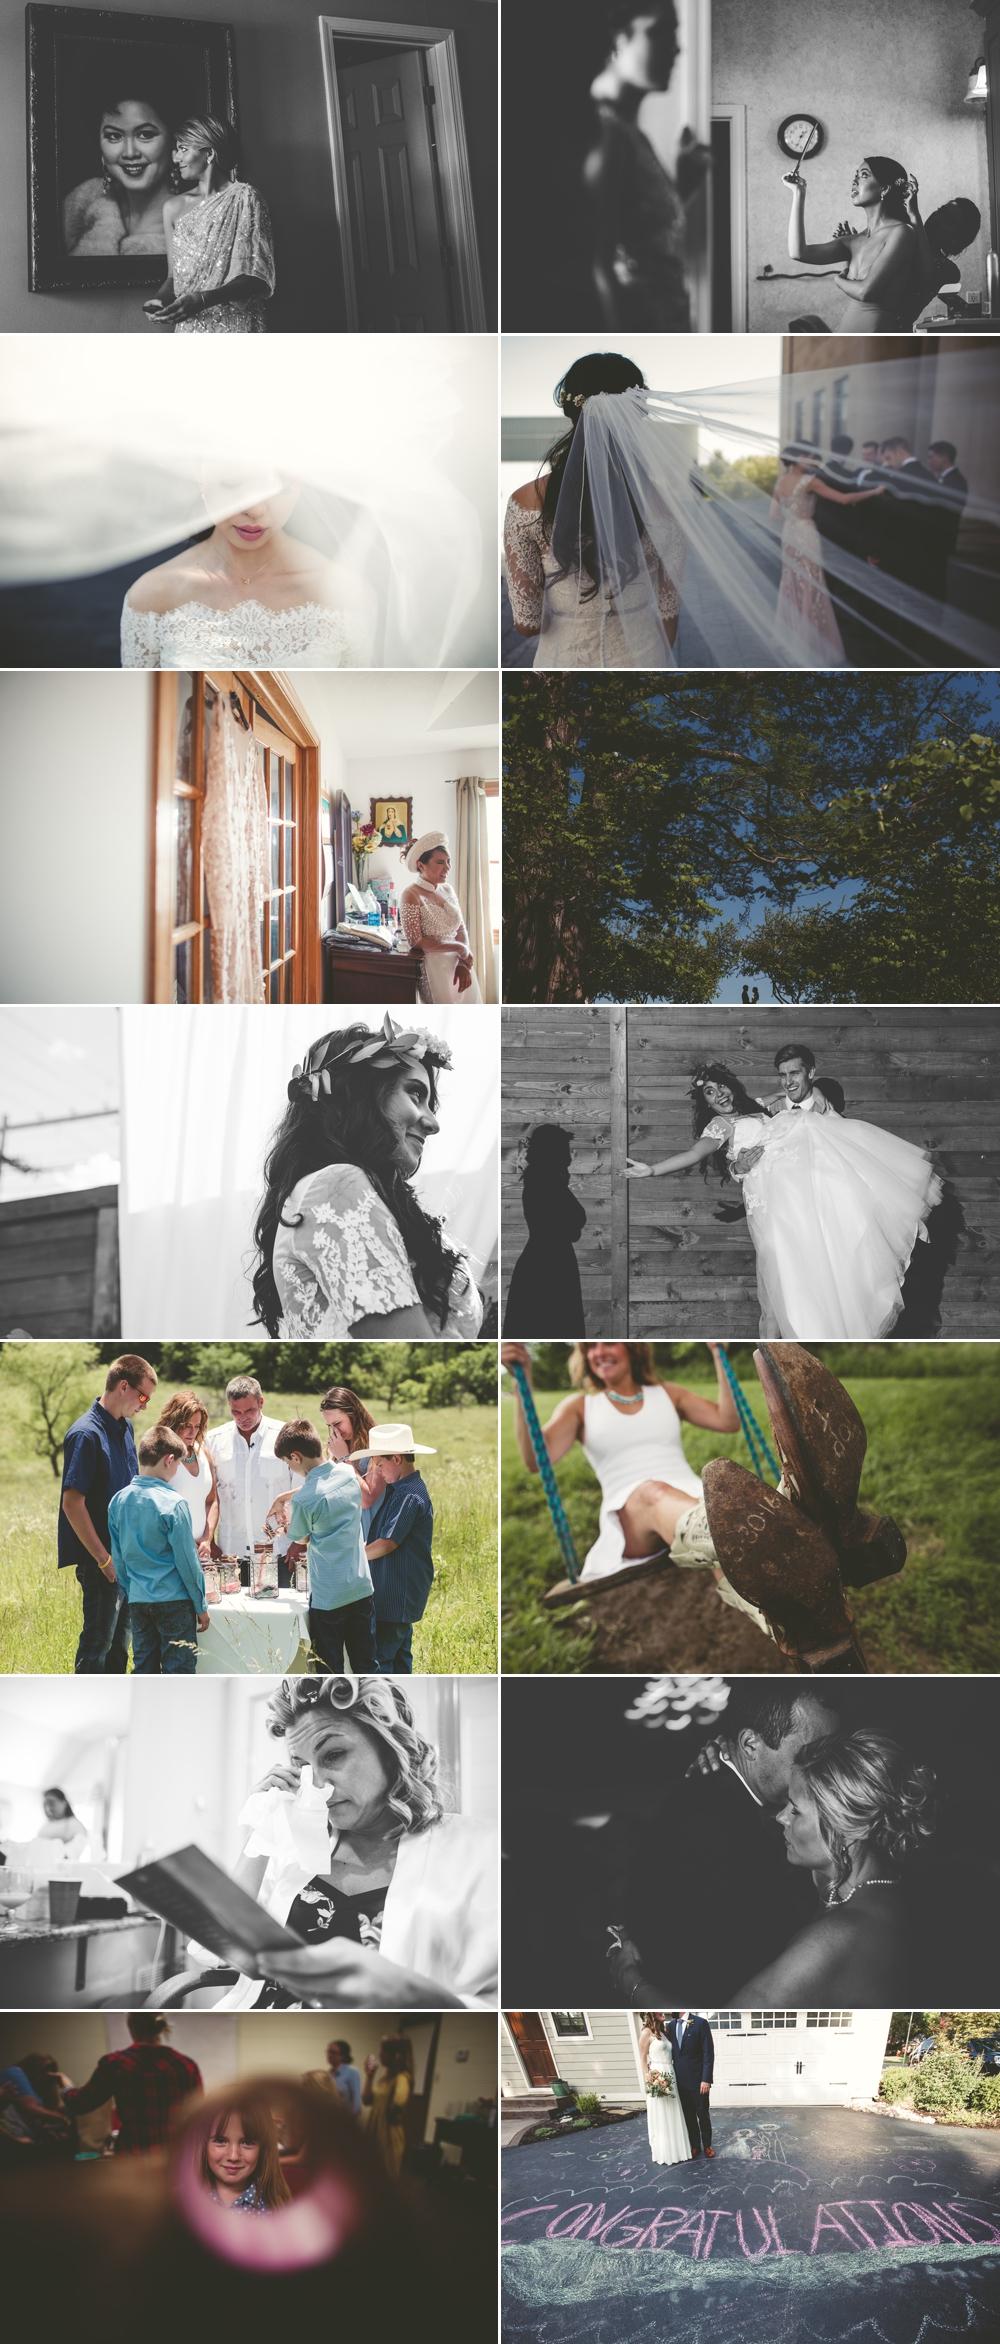 jason_domingues_photography_best_kansas_city_photography_kc_wedding_weddings0010.jpg